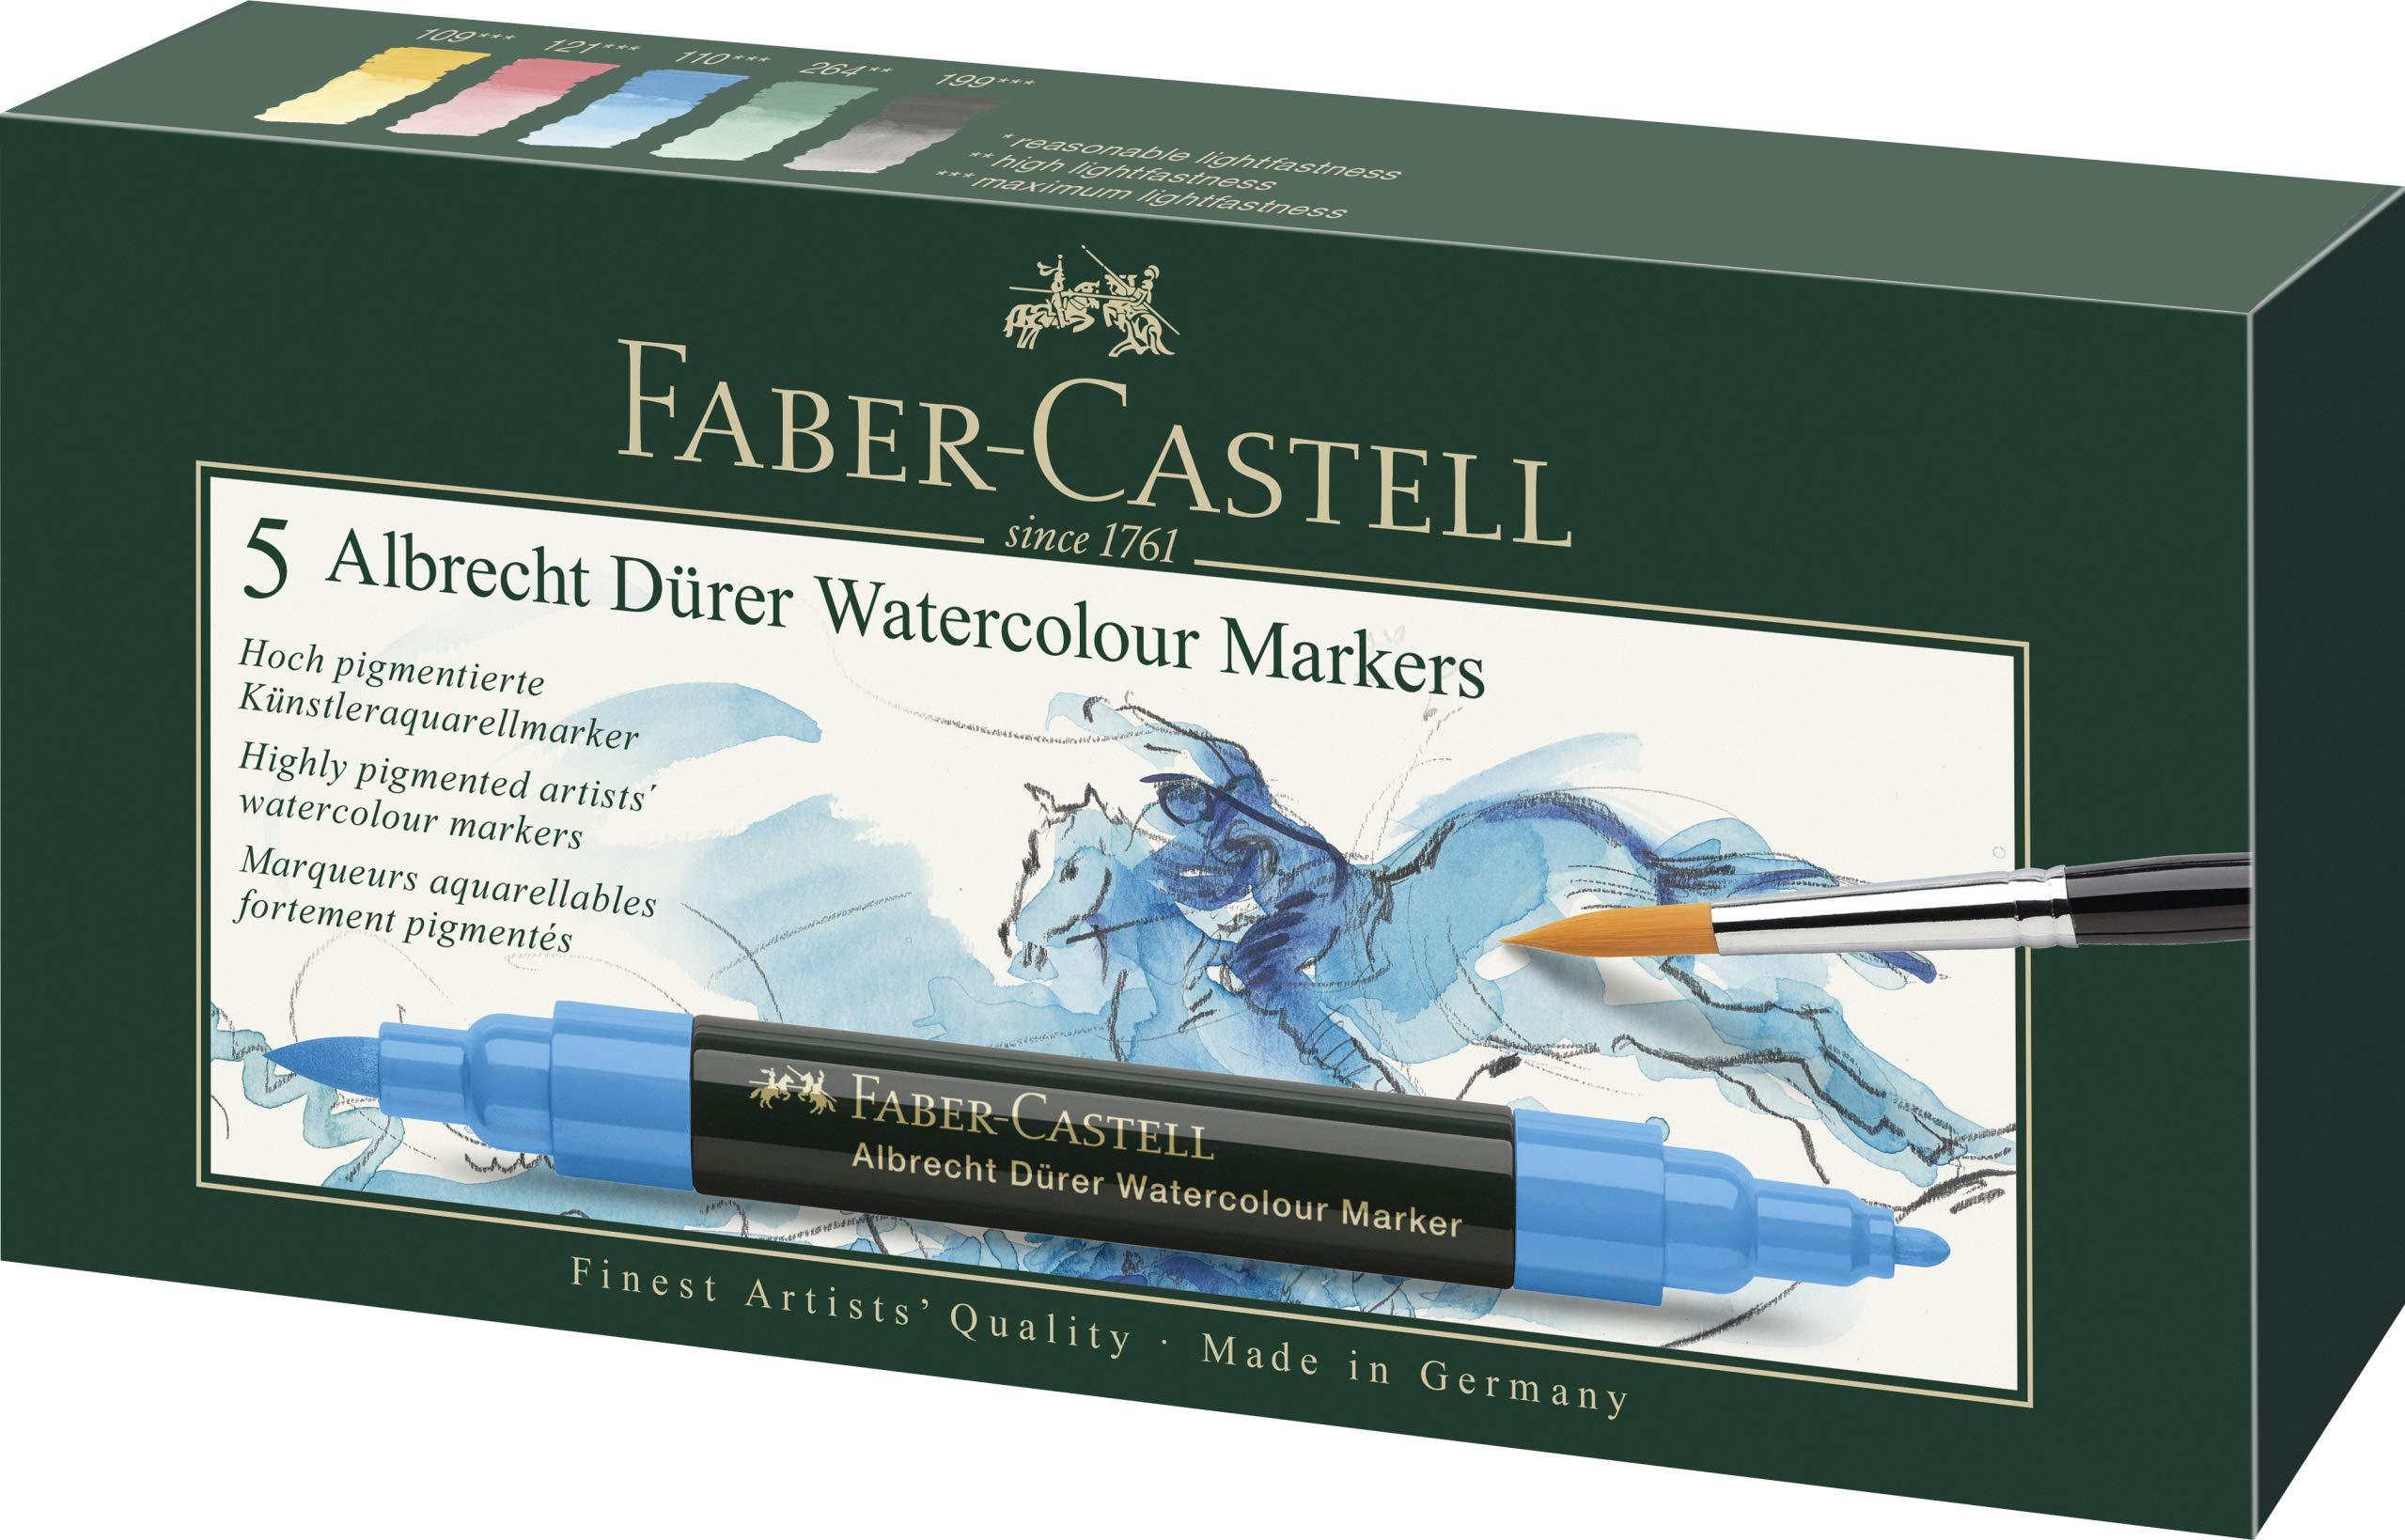 Faber-Castell Albrecht Durer Artists' Watercolor Markers - 5 Assorted Colors - Multipurpose Art Markers